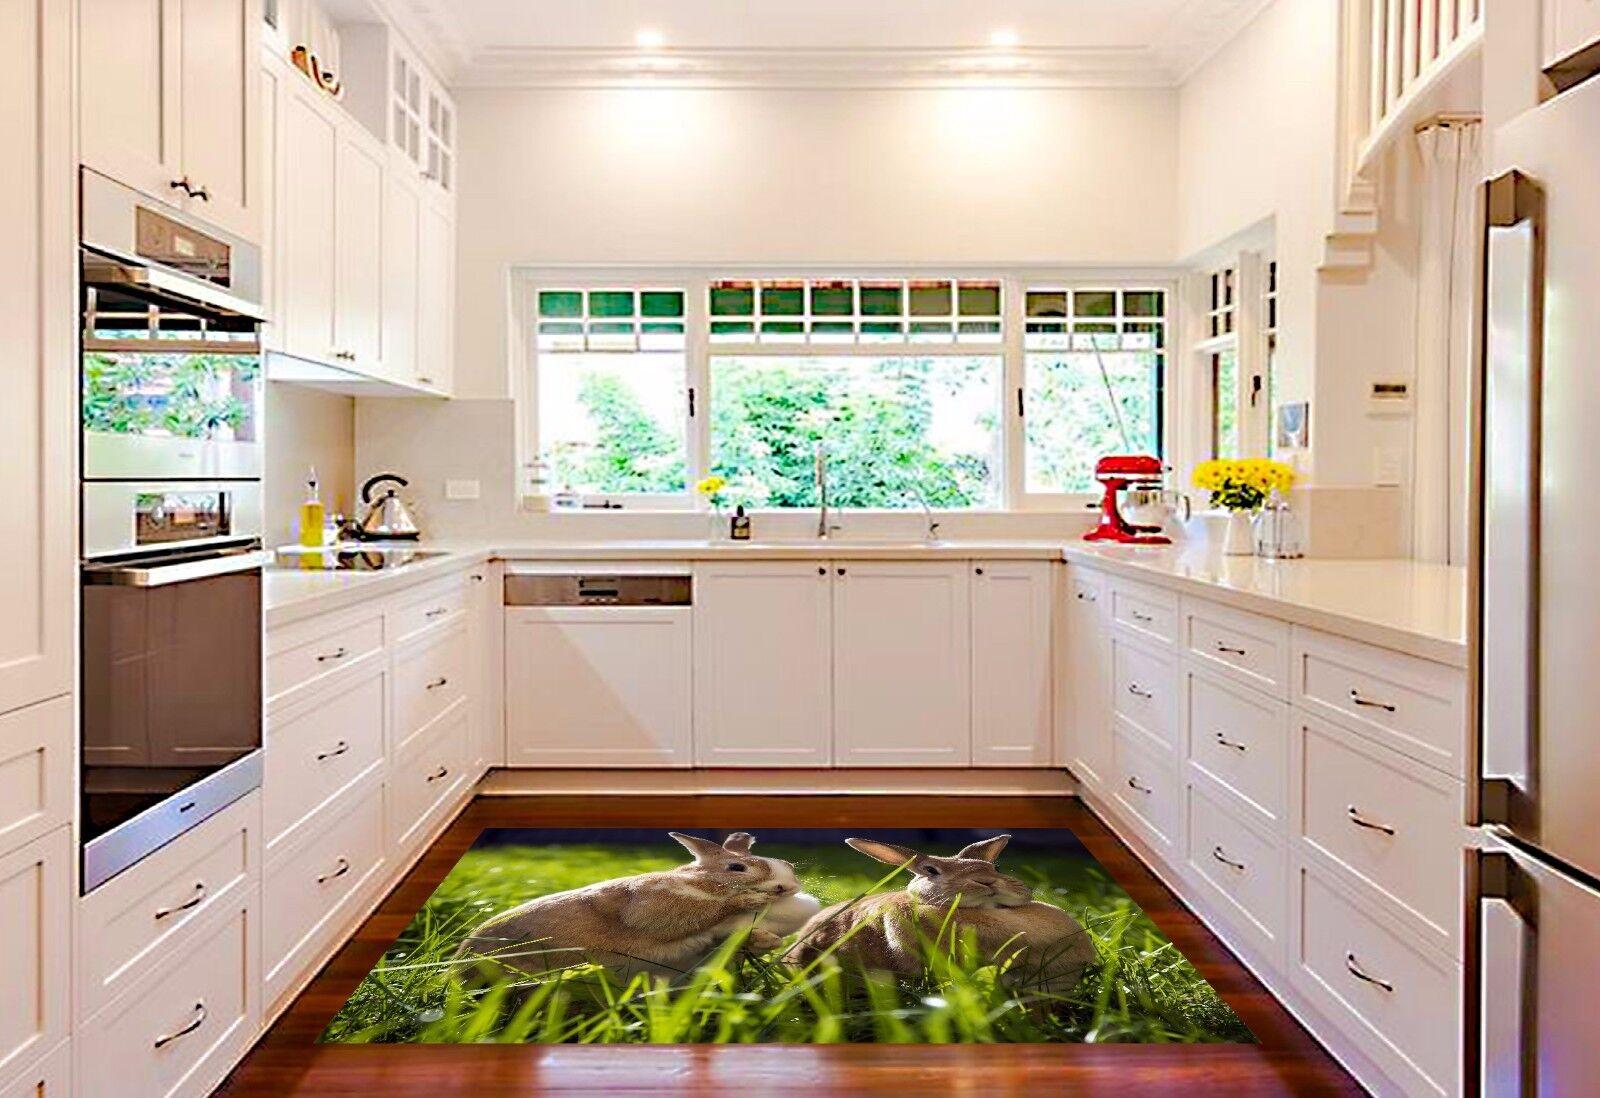 3D 3D 3D Hare Bush 826 Kitchen Mat Floor Murals Wall Print Wall AJ WALLPAPER UK Kyra 5fc121